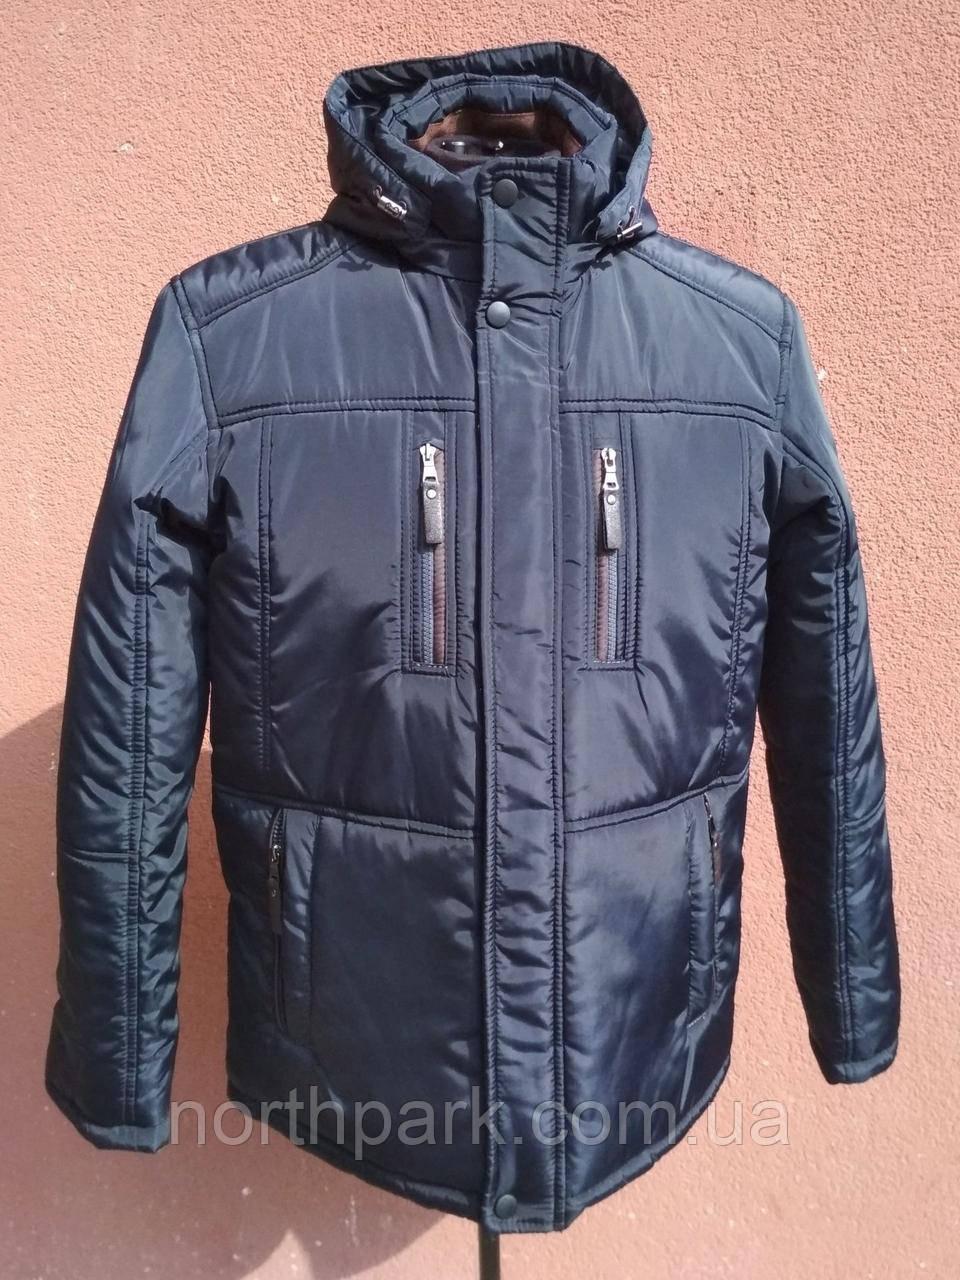 Чоловіча зимова куртка класична, темно-синя